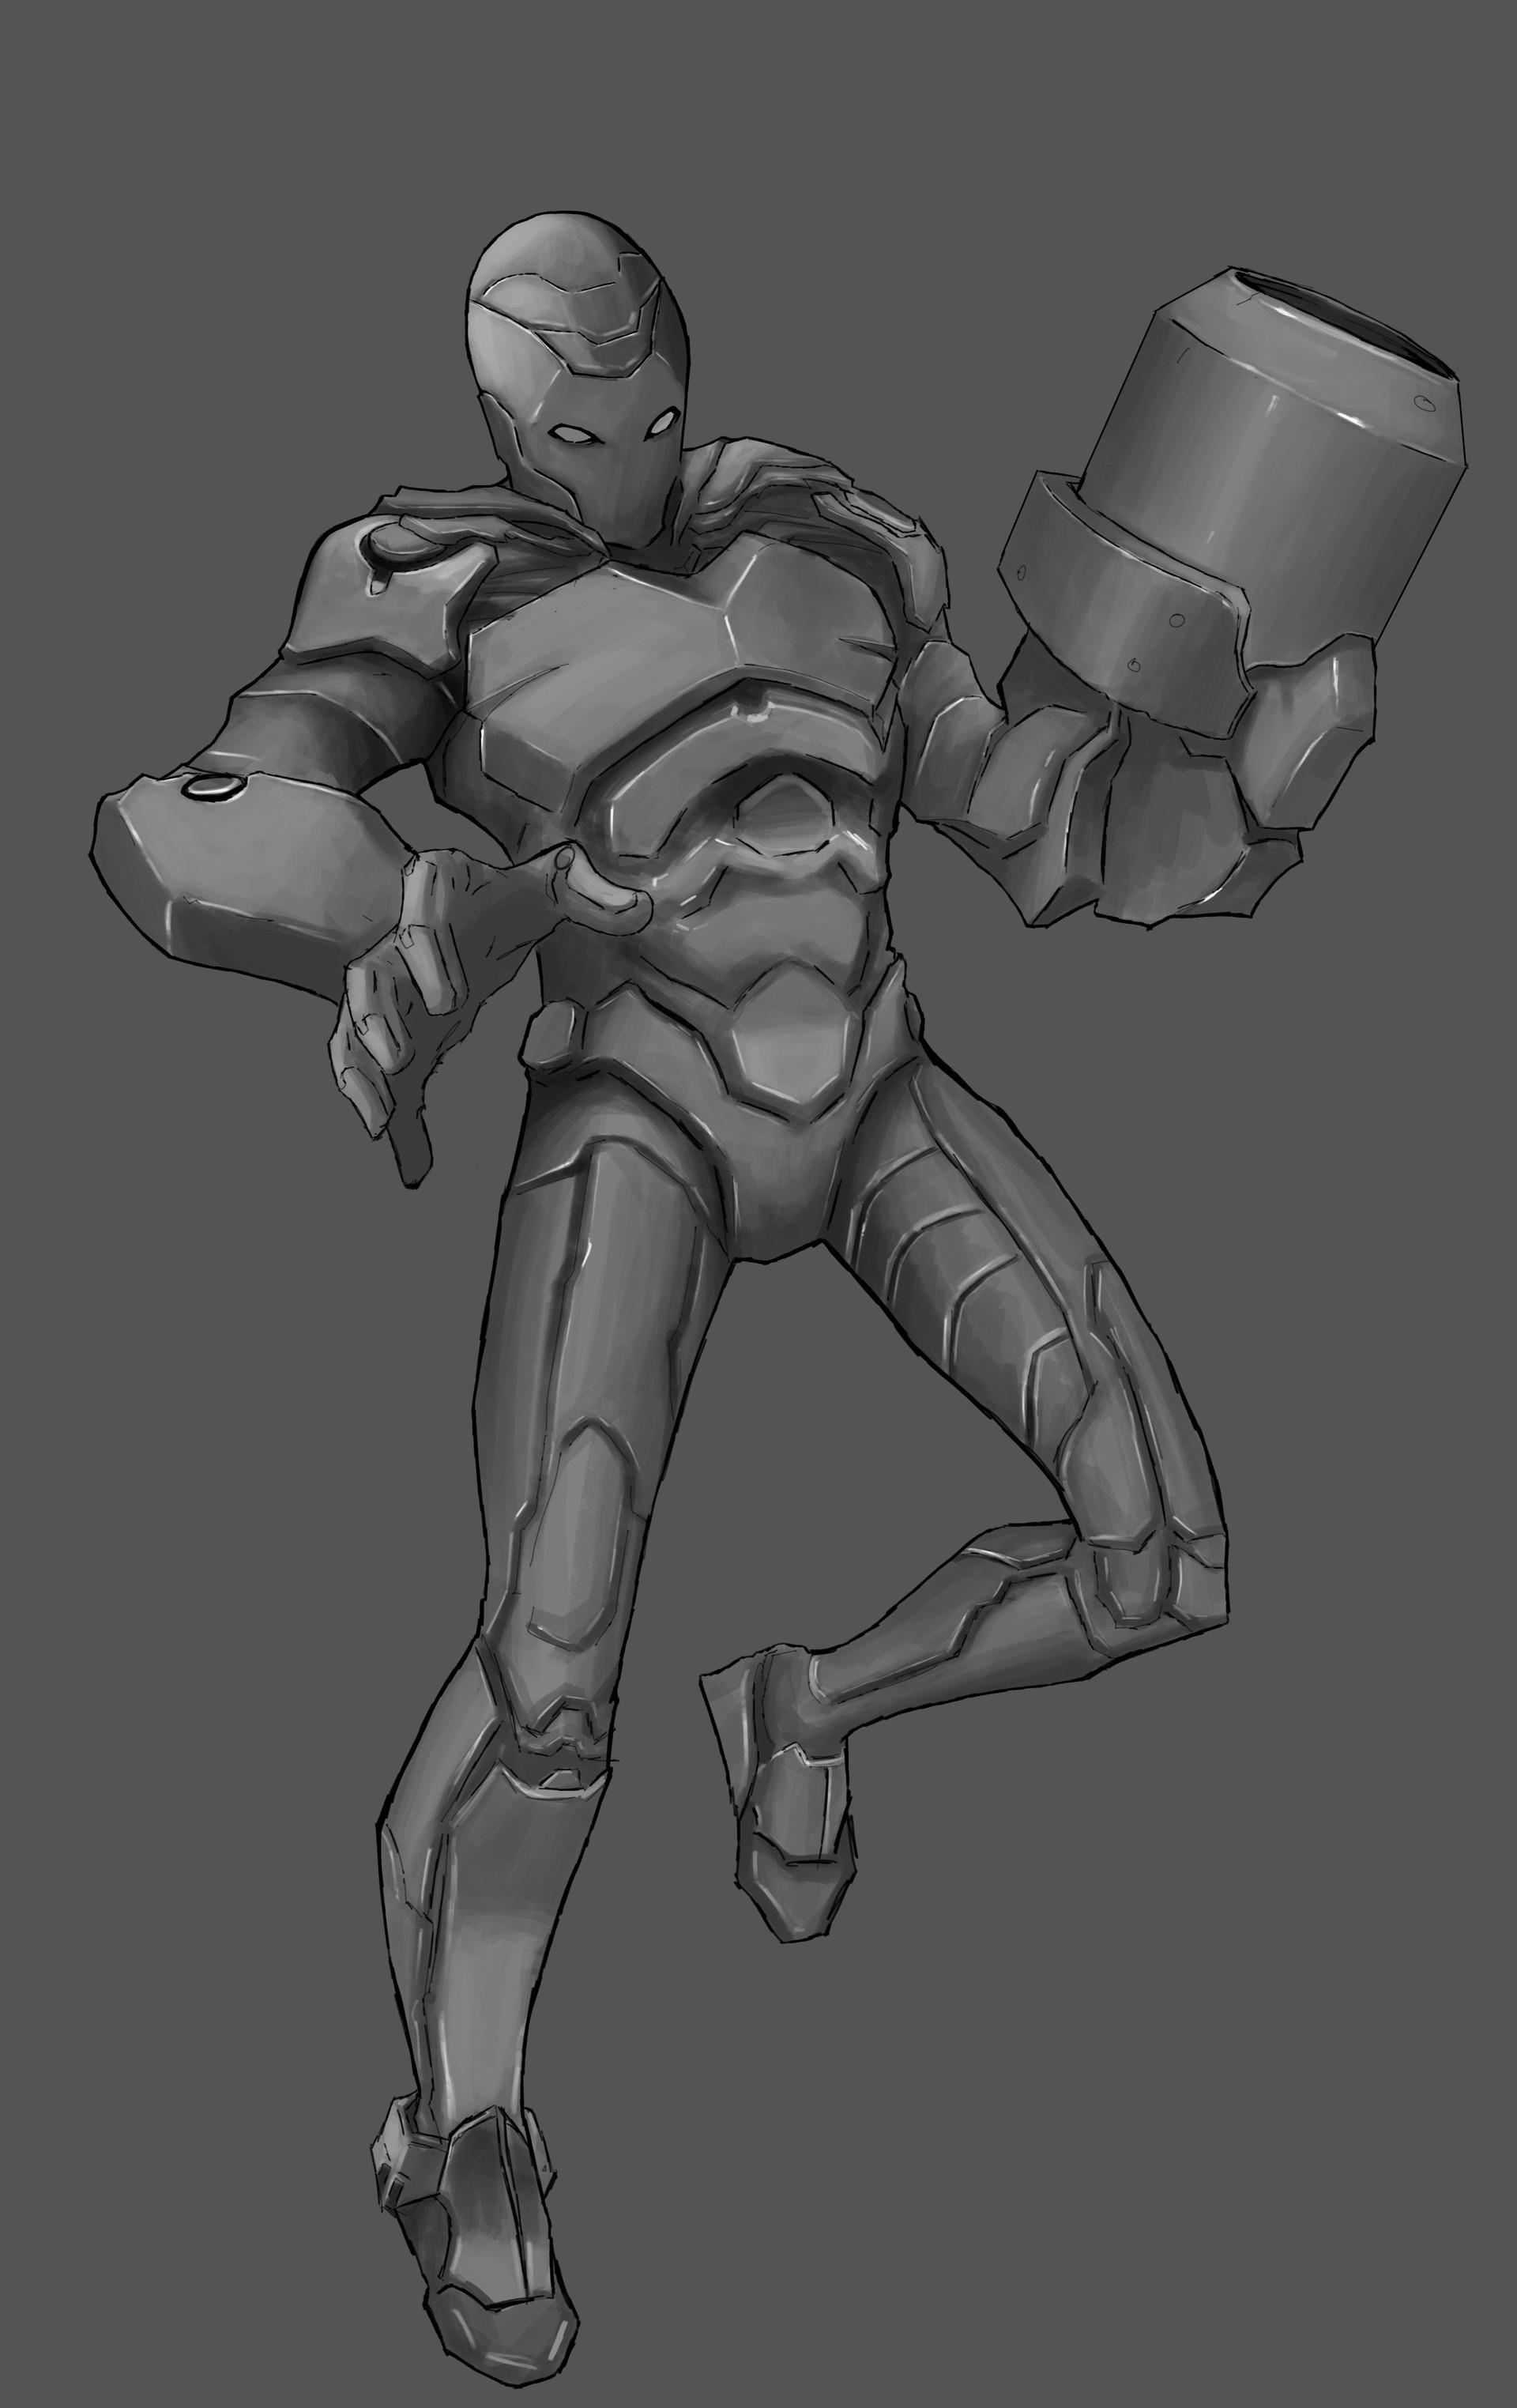 Gbenle maverick cyborg 6 6 2